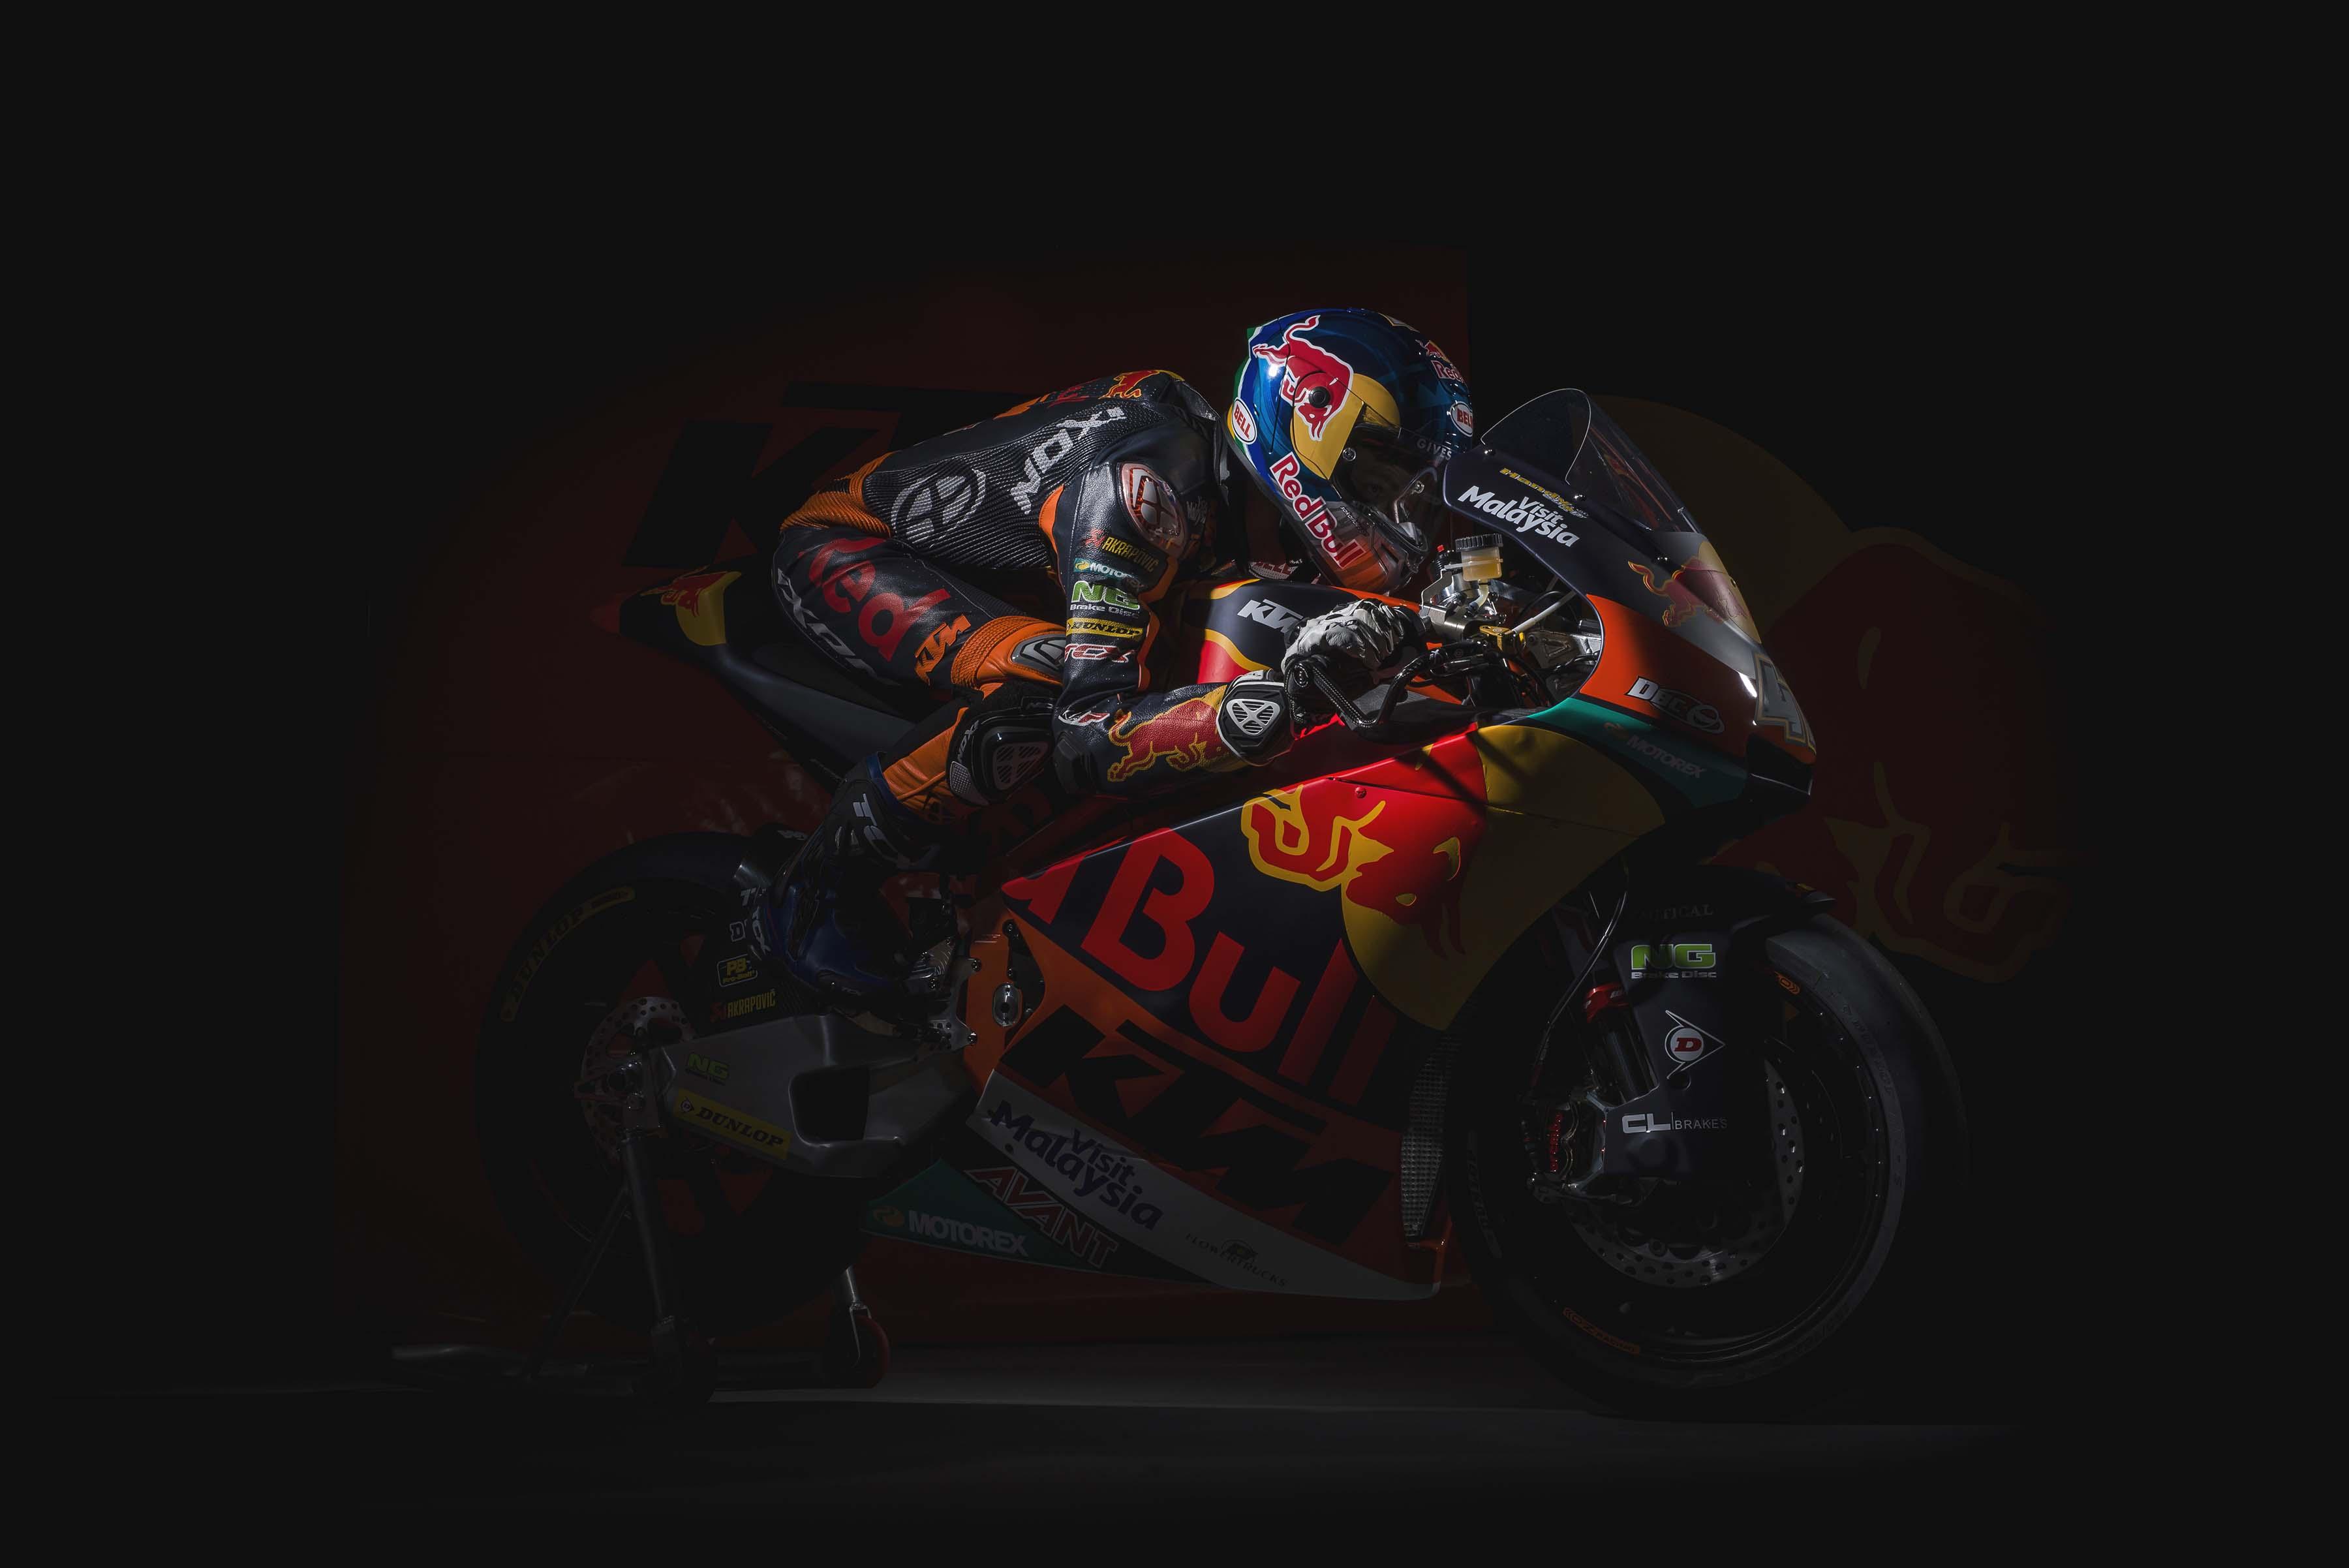 Moody Photos of the KTM Moto2 Race Bike - Asphalt & Rubber